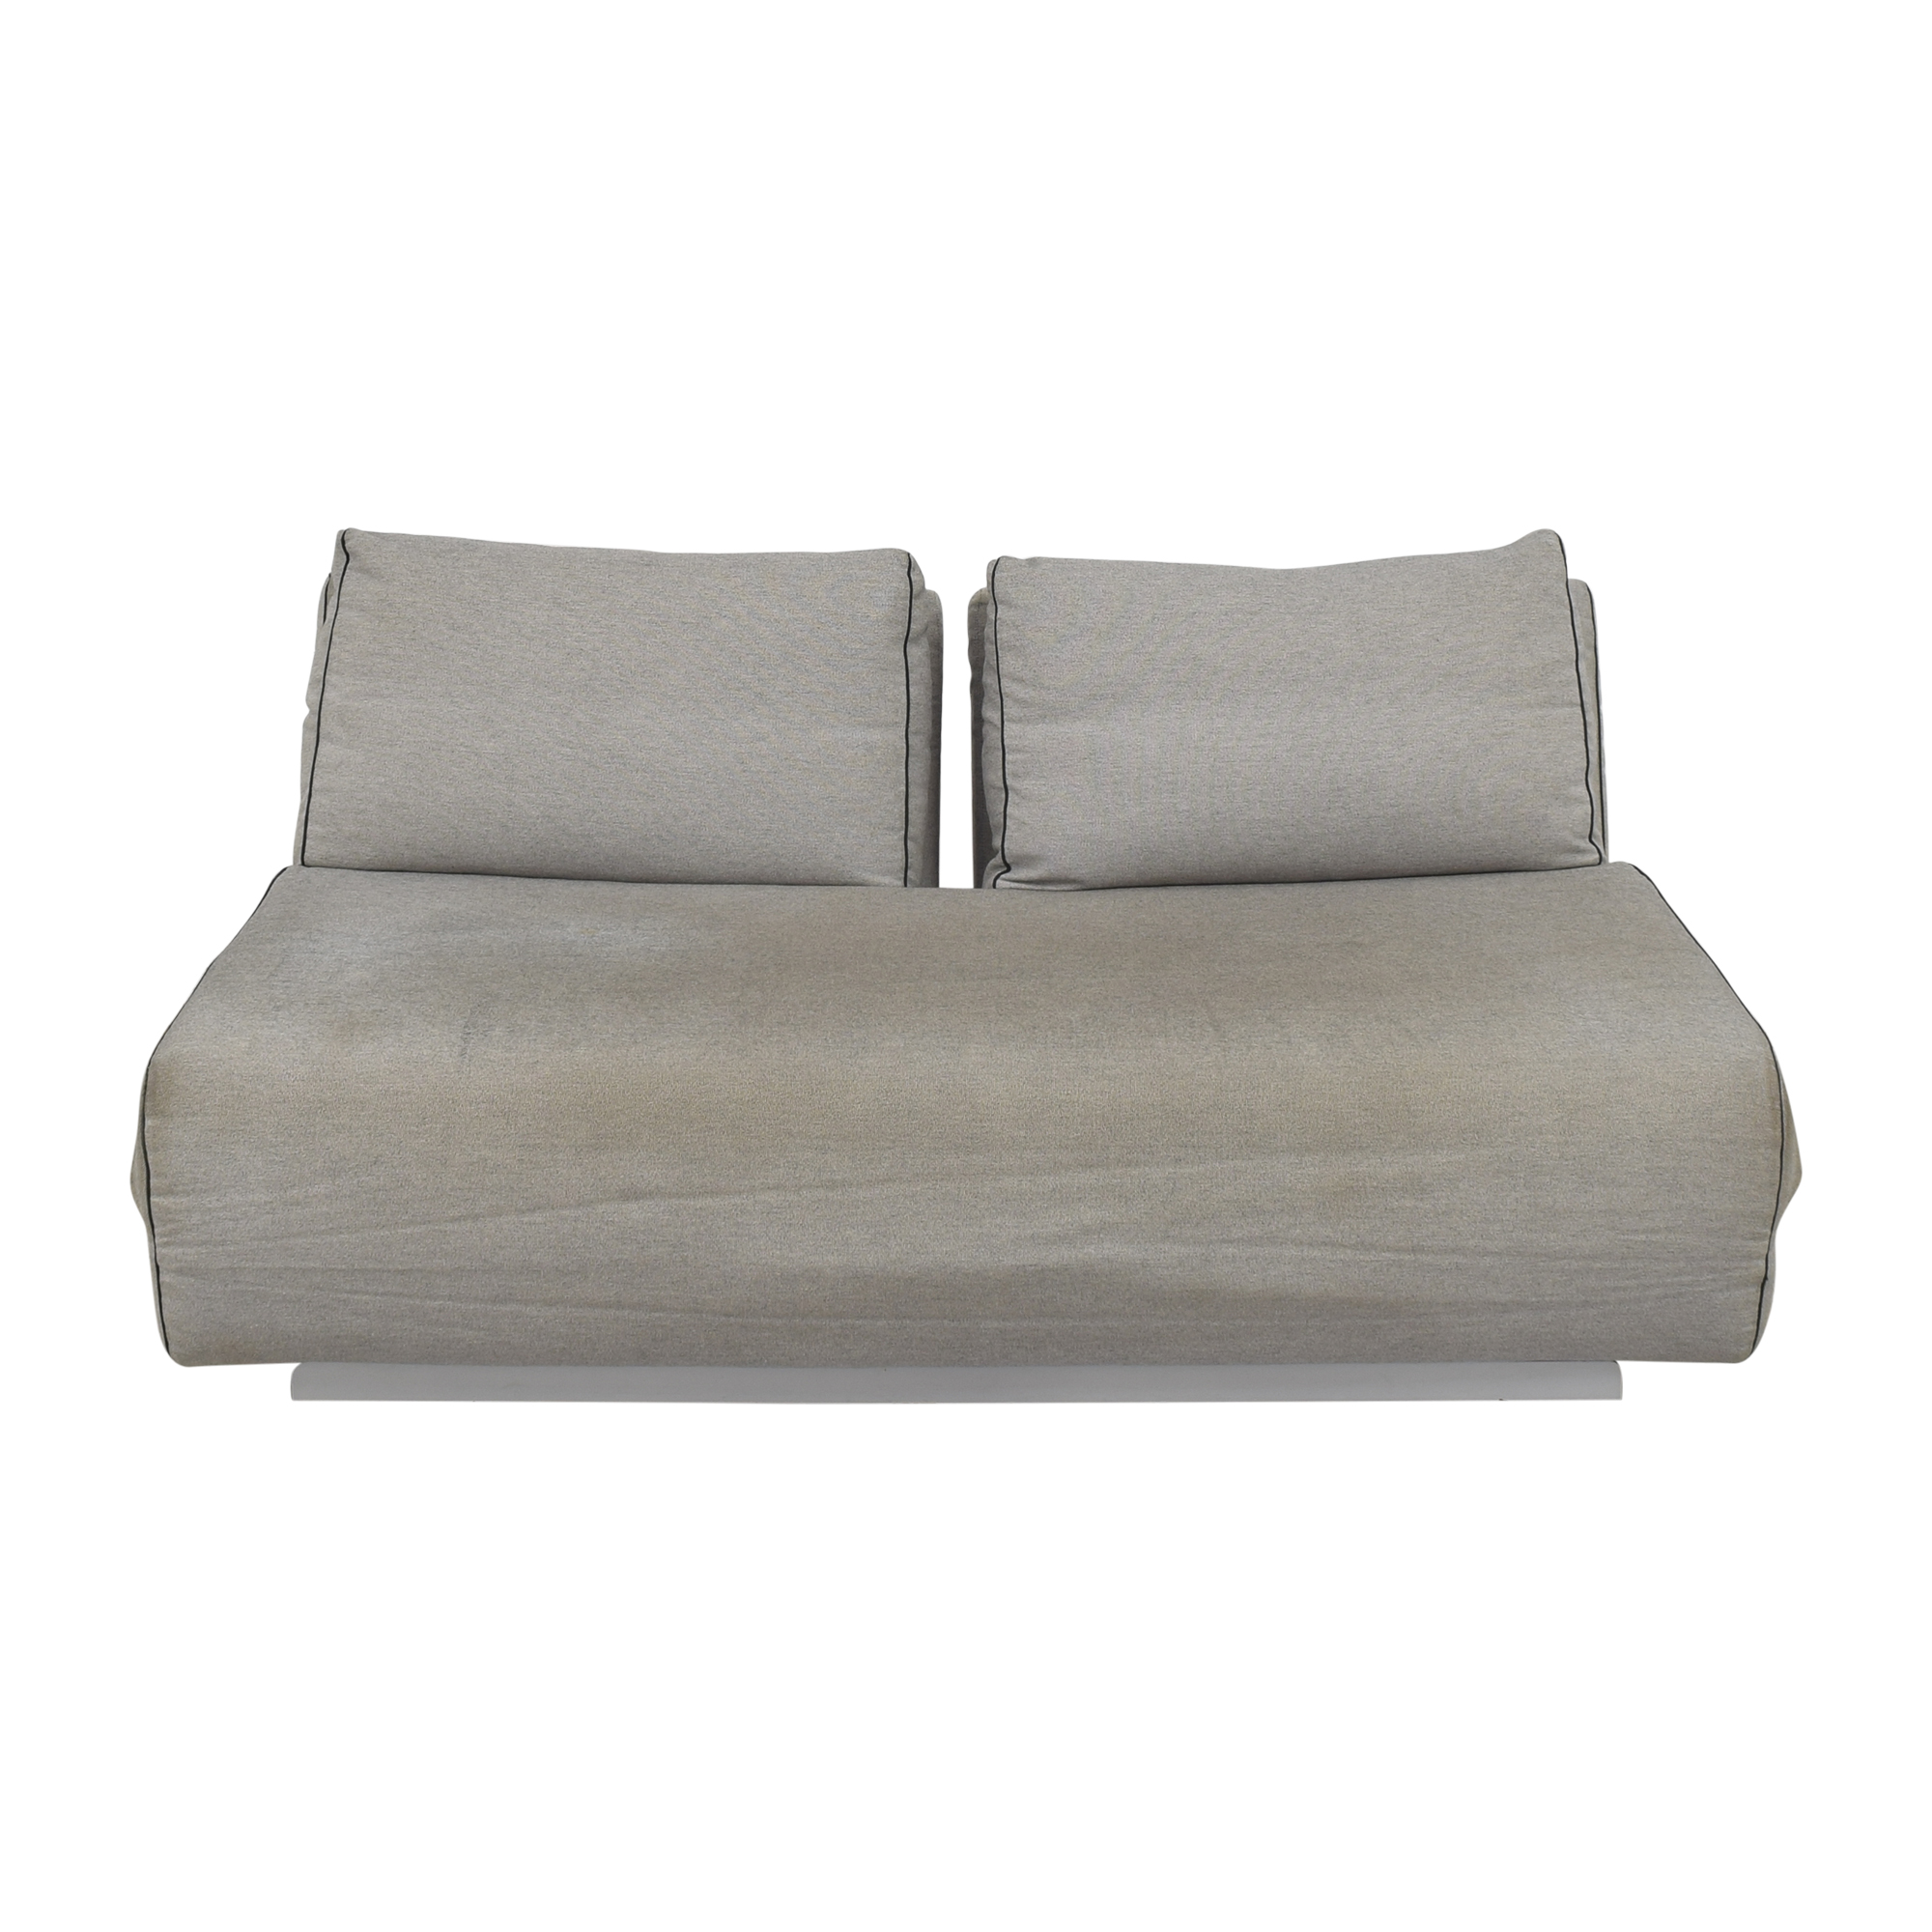 Softline Softline City 2.5 Seater Sofa Bed Sofas